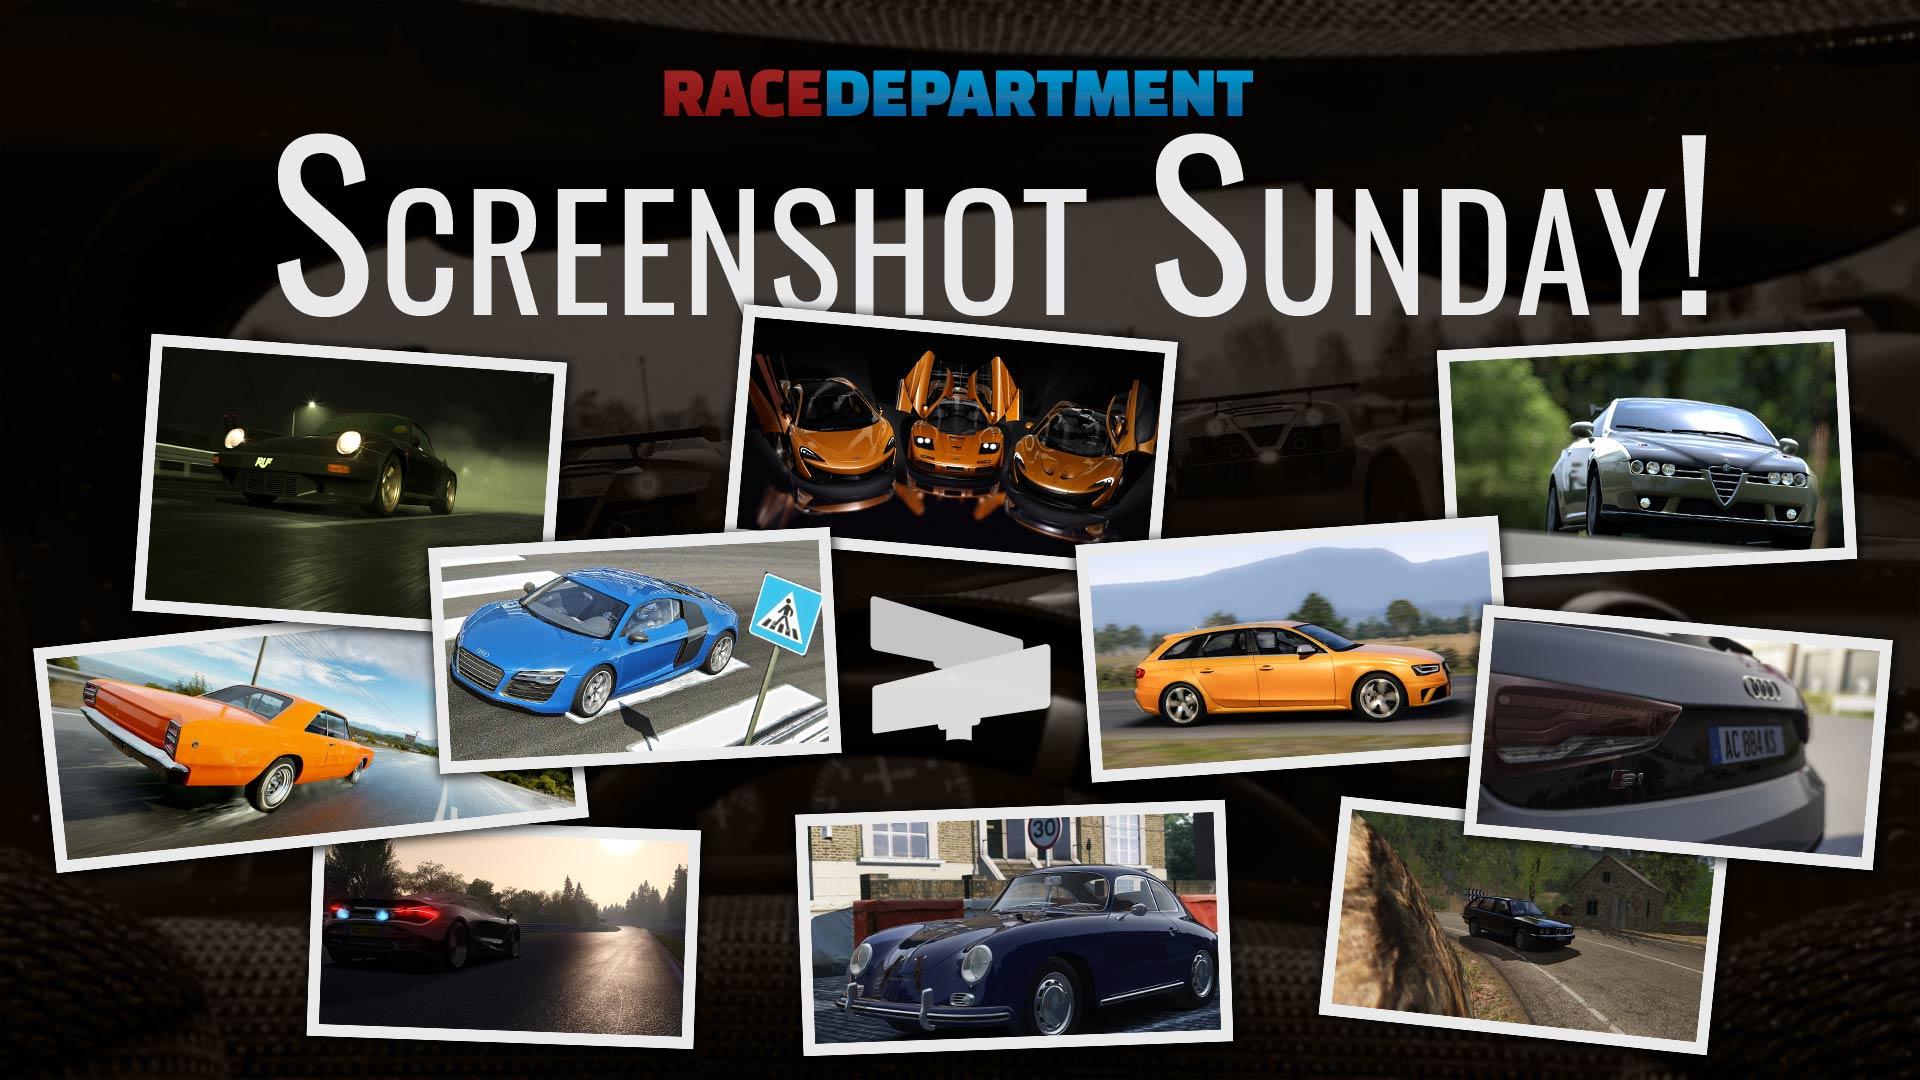 Screenshot Sunday - Street Cars.jpg